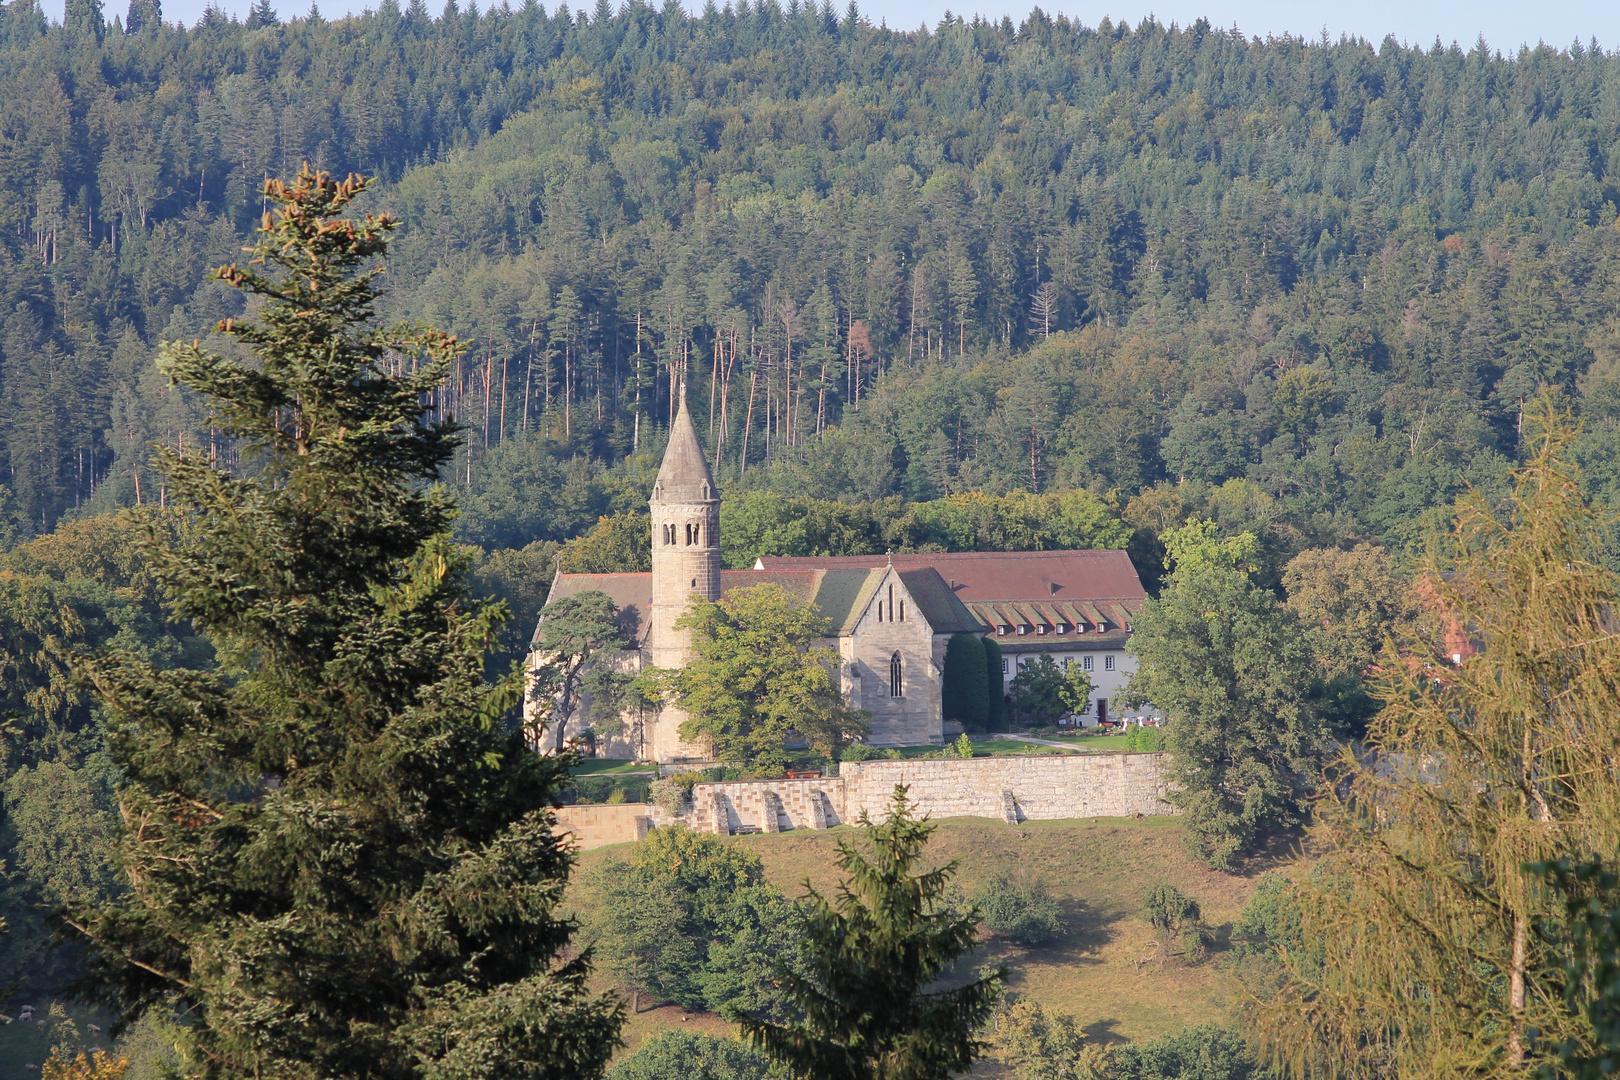 Kloster Lorch II